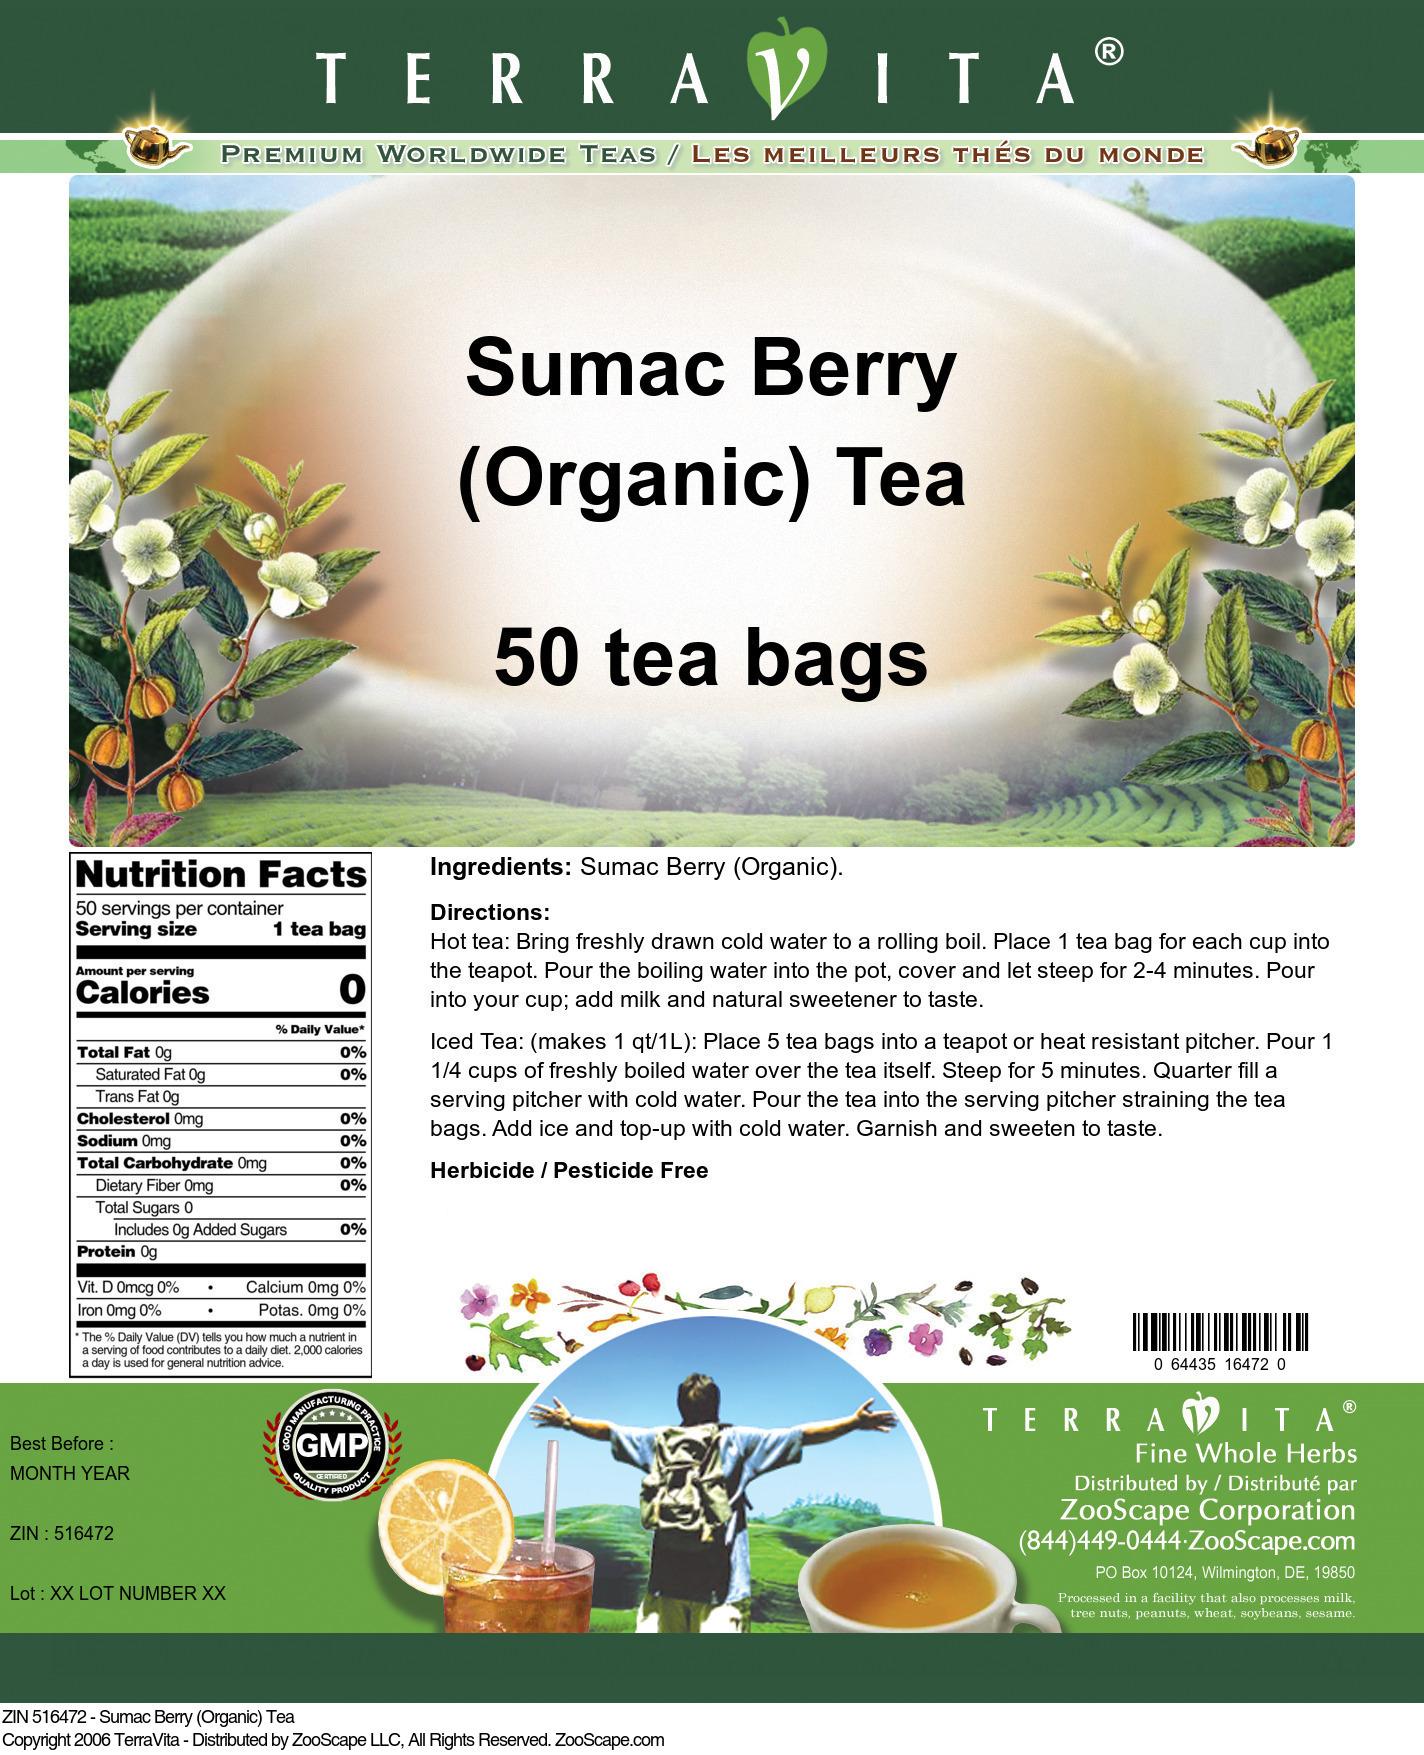 Sumac Berry (Organic) Tea